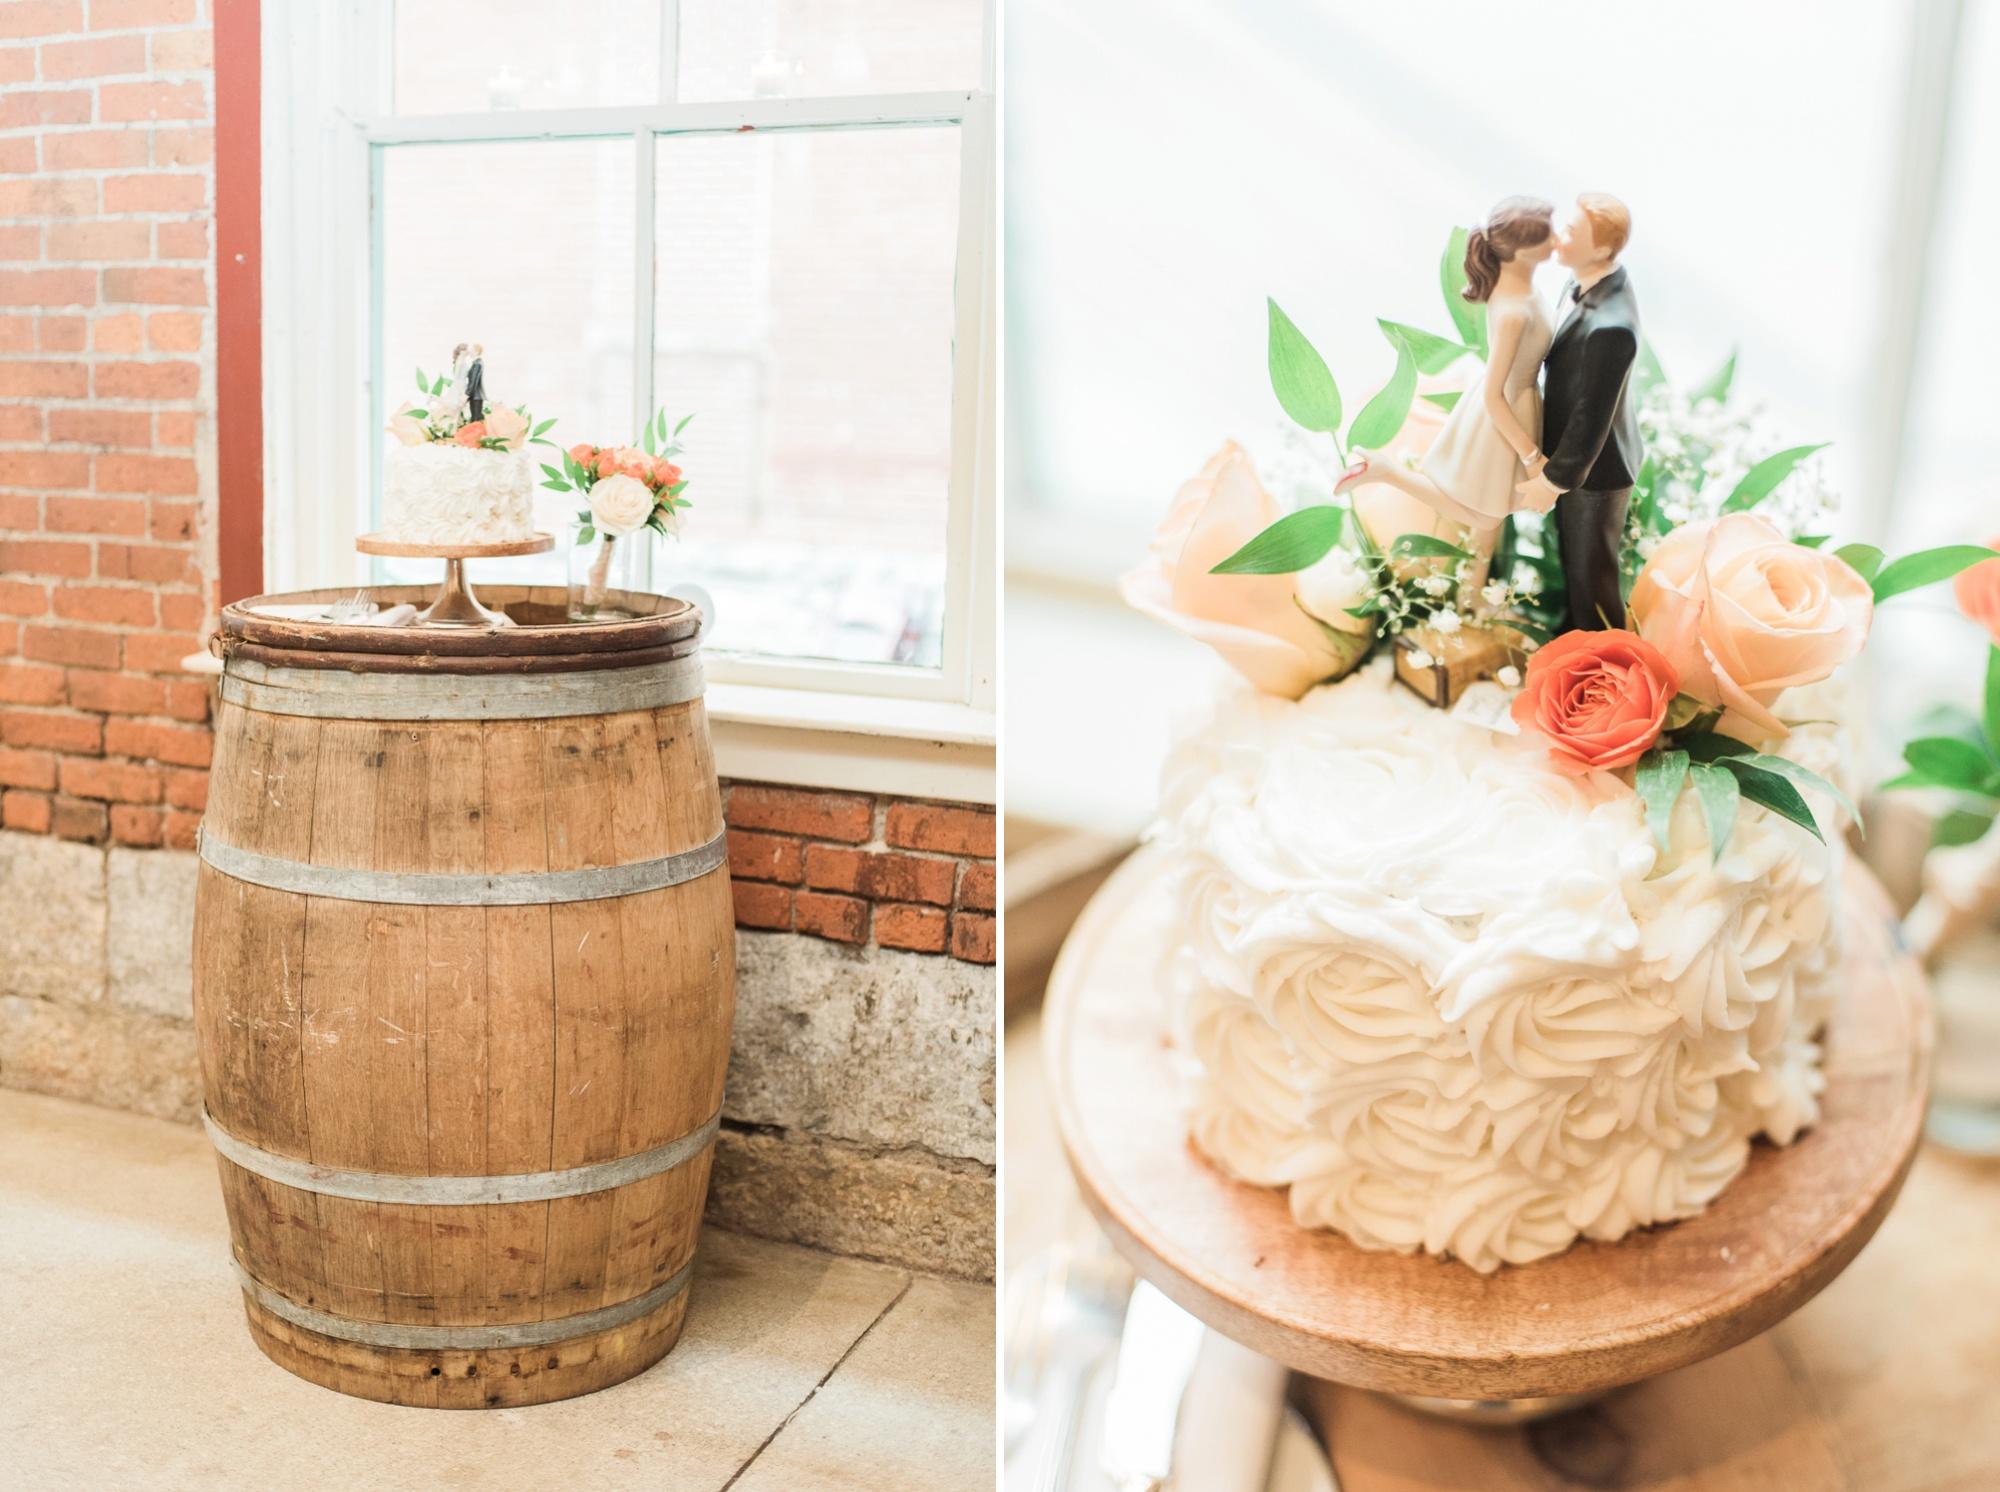 via-vecchia-winery-wedding-columbus-ohio-100.jpg